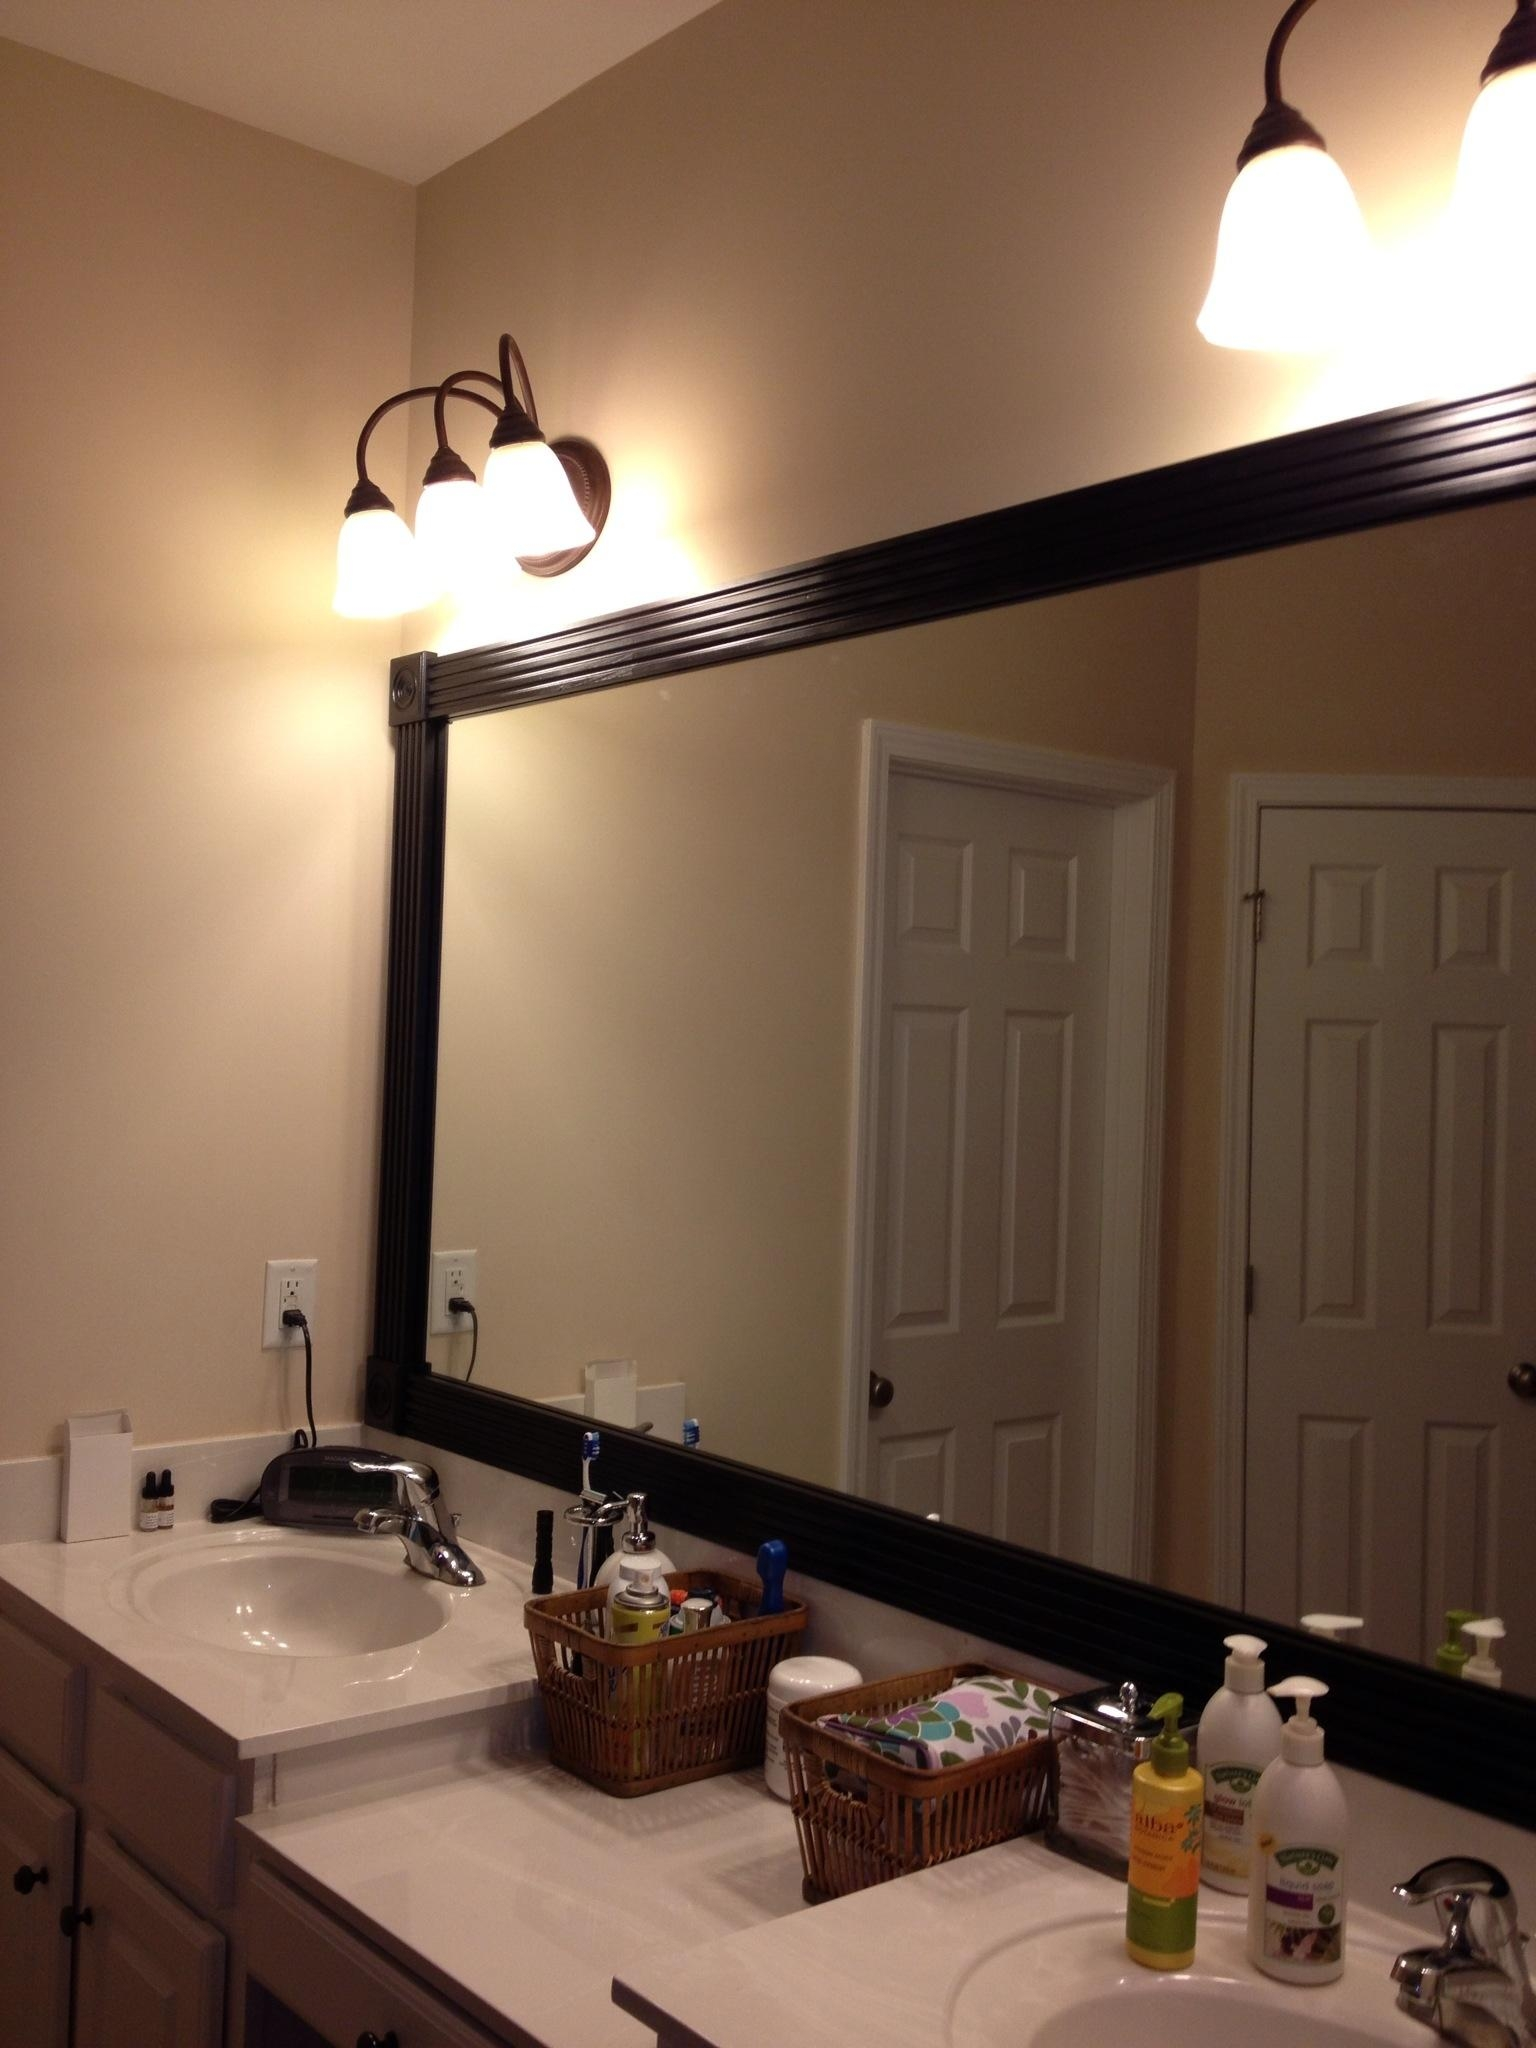 Oak Framed Wall Mirror 123 Beautiful Decoration Also This Oak Intended For Oak Framed Wall Mirror (Image 12 of 20)